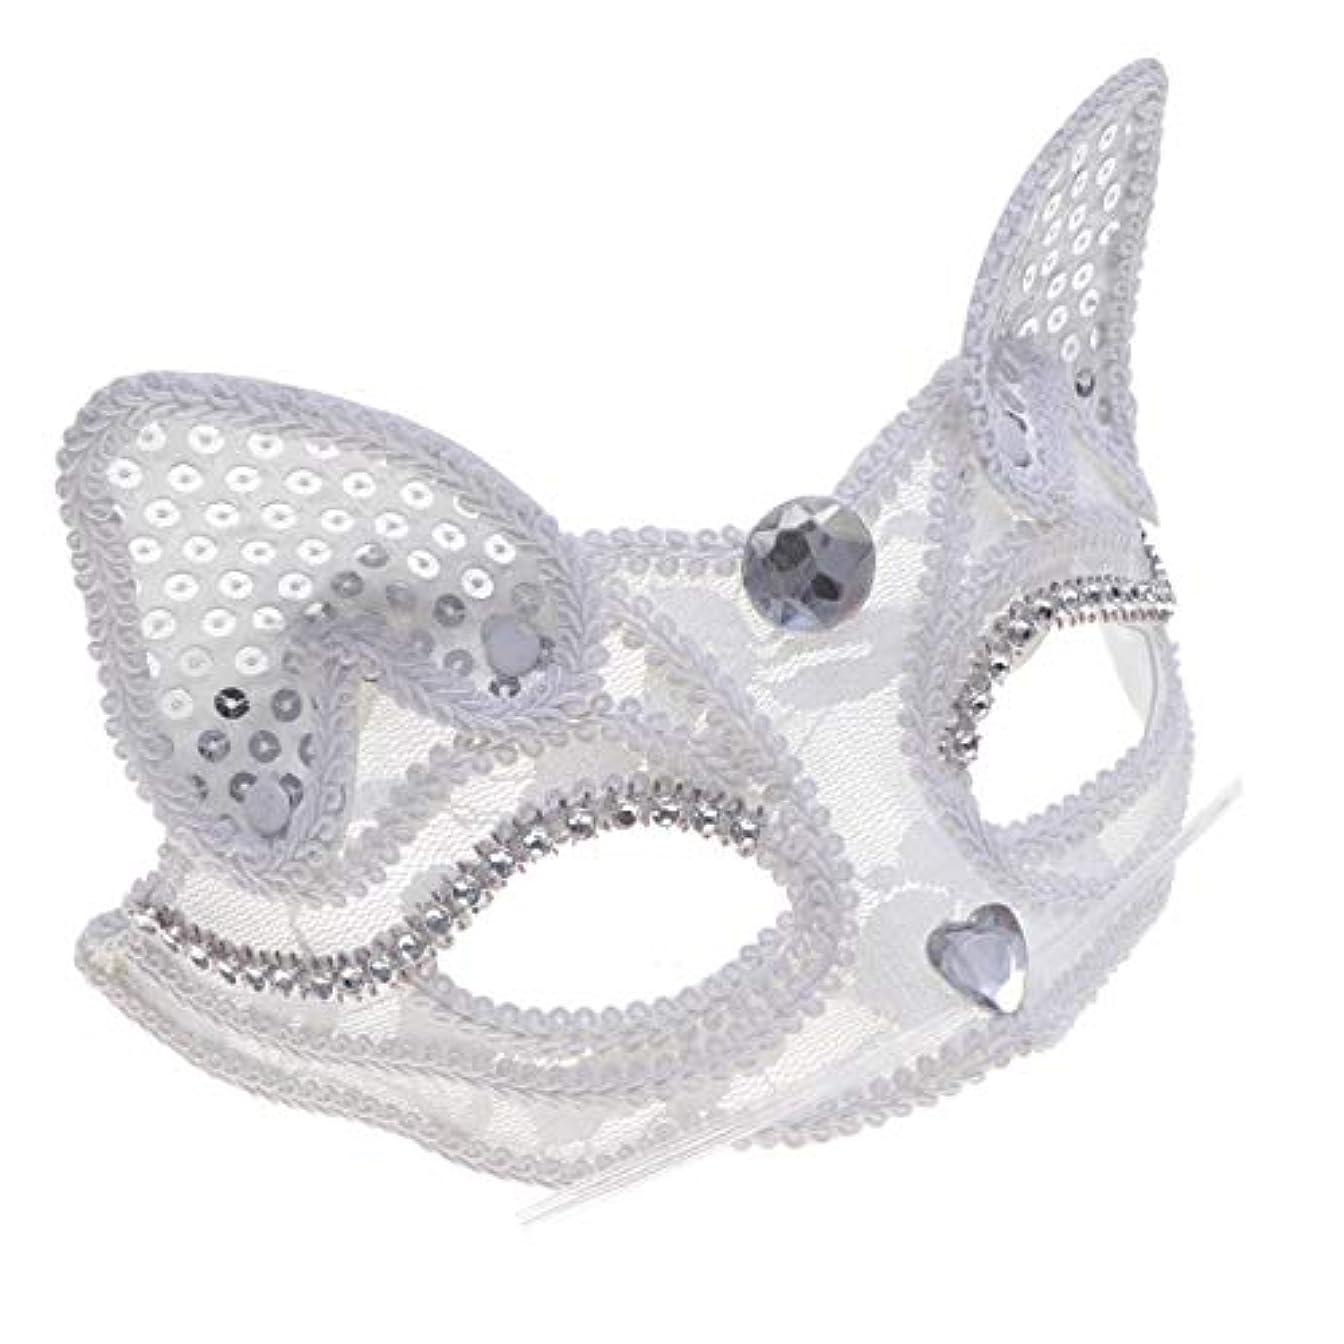 BESTOYARD キツネハーフマスク動物キツネレースマスク女性用女の子ドレスアップ仮面舞踏会パフォーマンスマスクハロウィンパーティー用(フェザーホワイトなし)